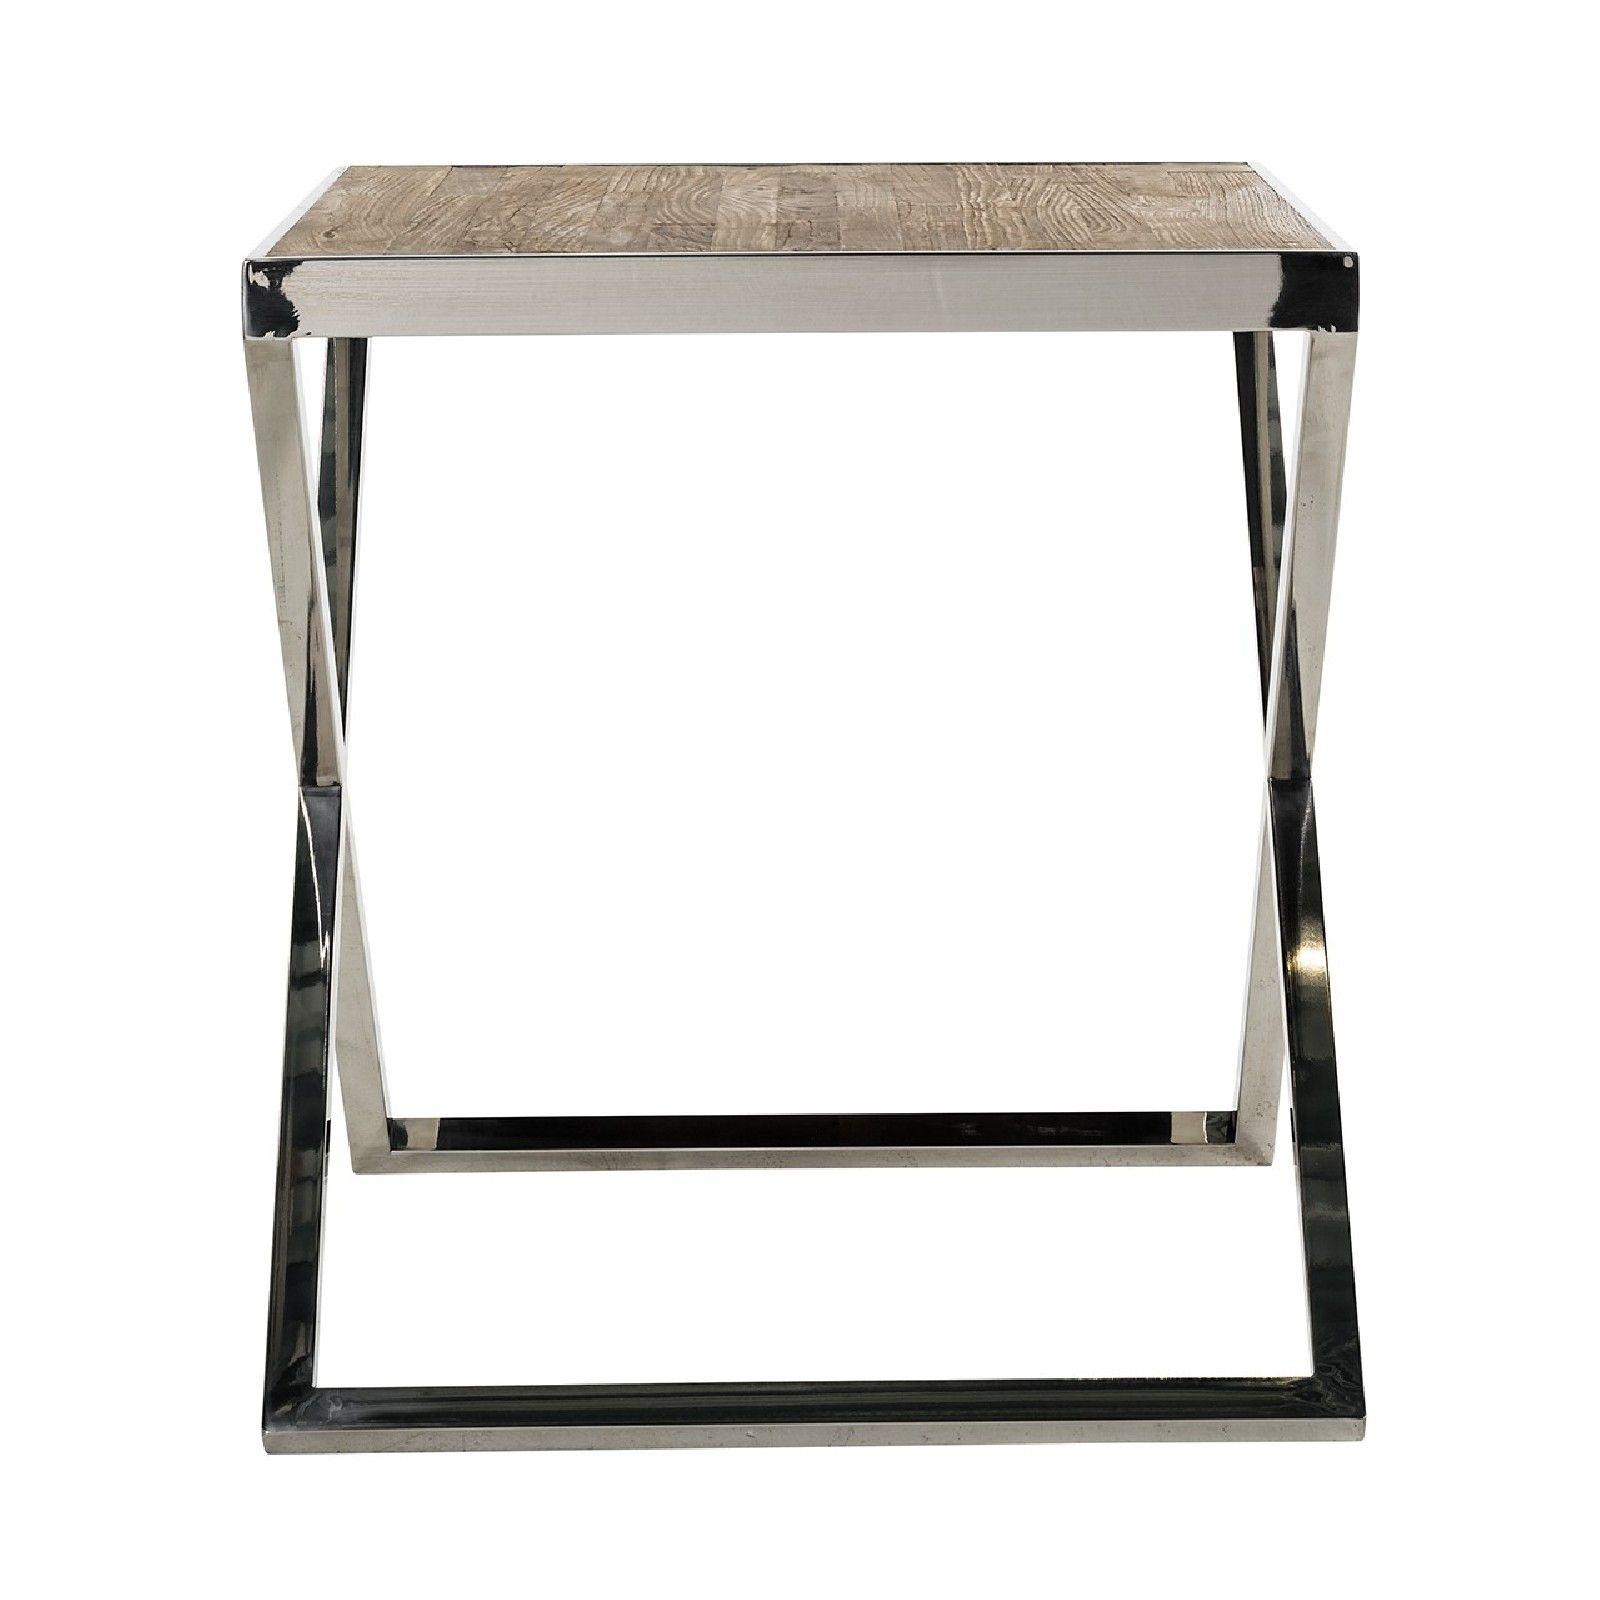 Table d'angle Redmond 55x55 Meuble Déco Tendance - 361